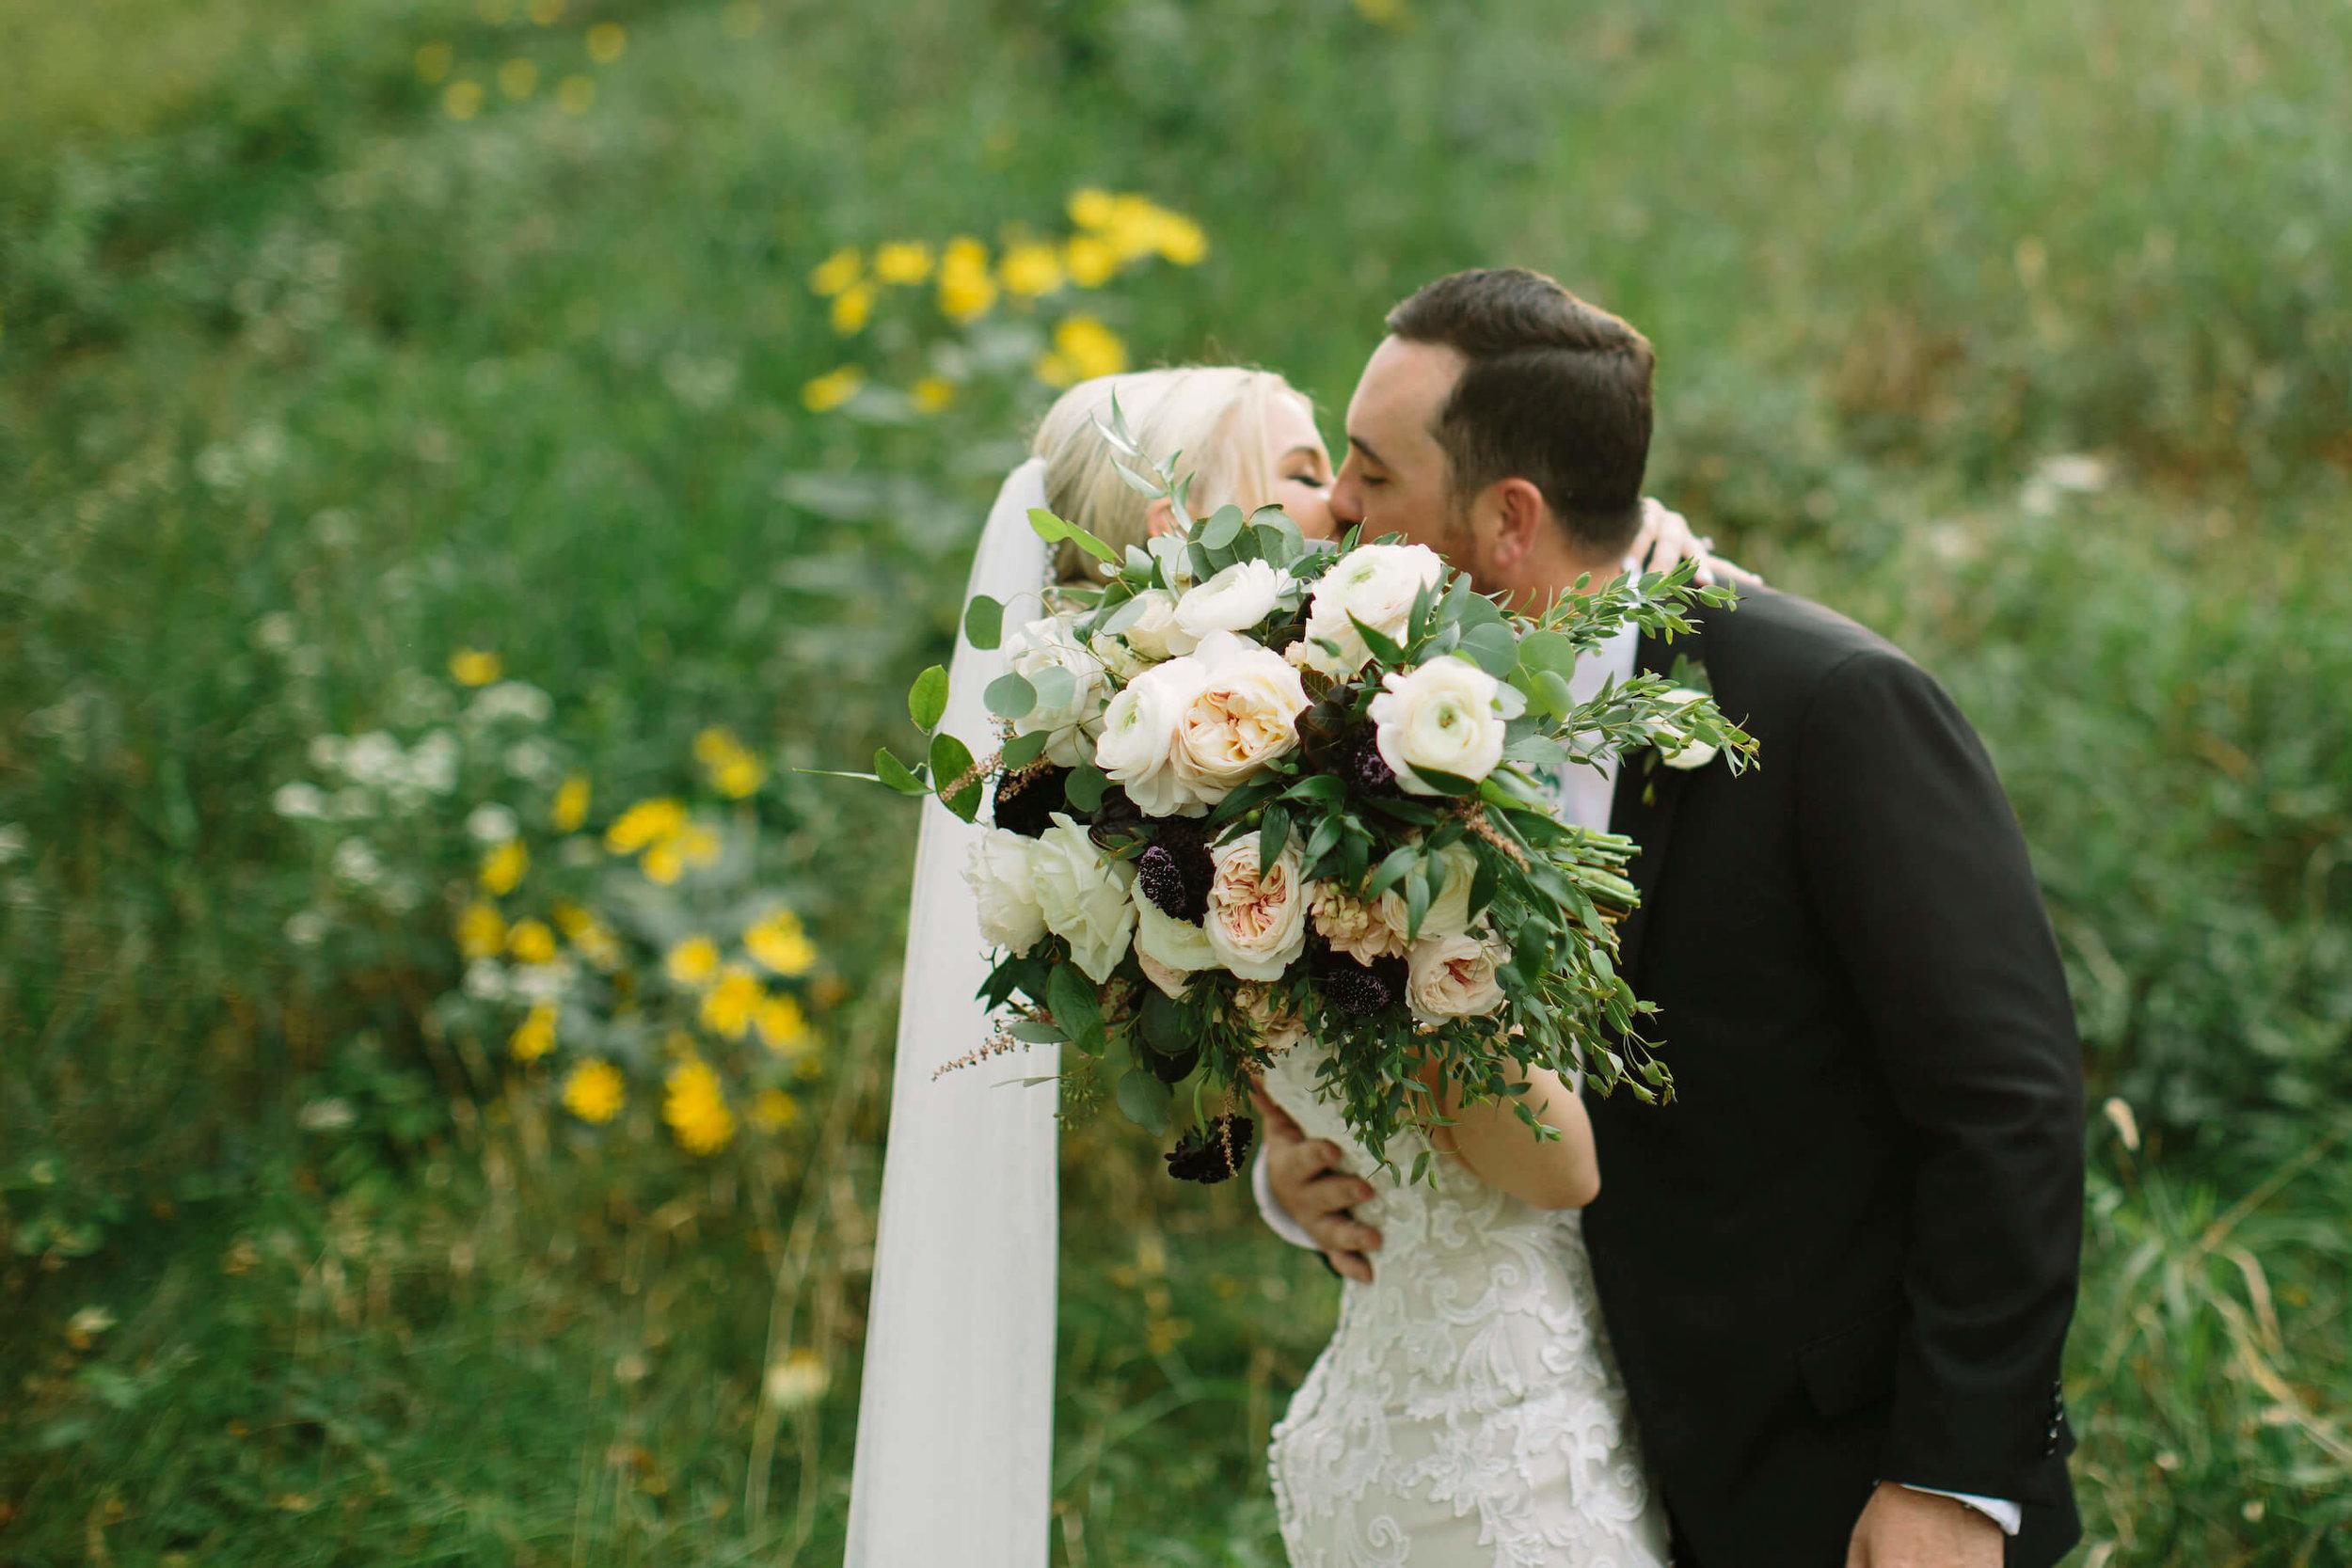 engle-olson-april-cj-wedding-jessica-holleque-13.jpg